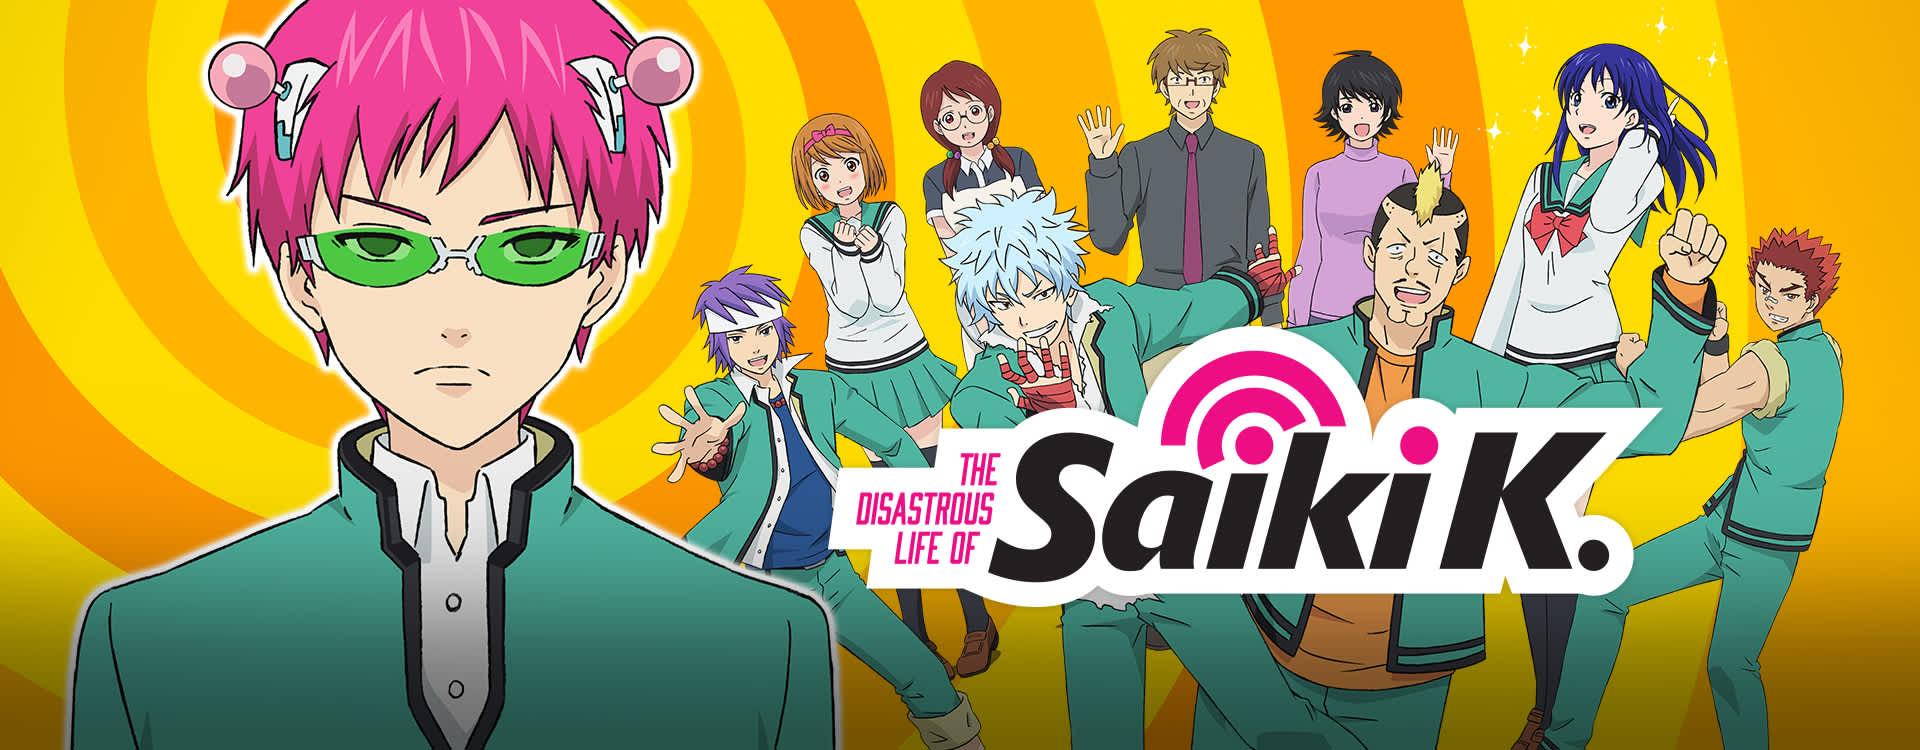 Adult arts animation anime